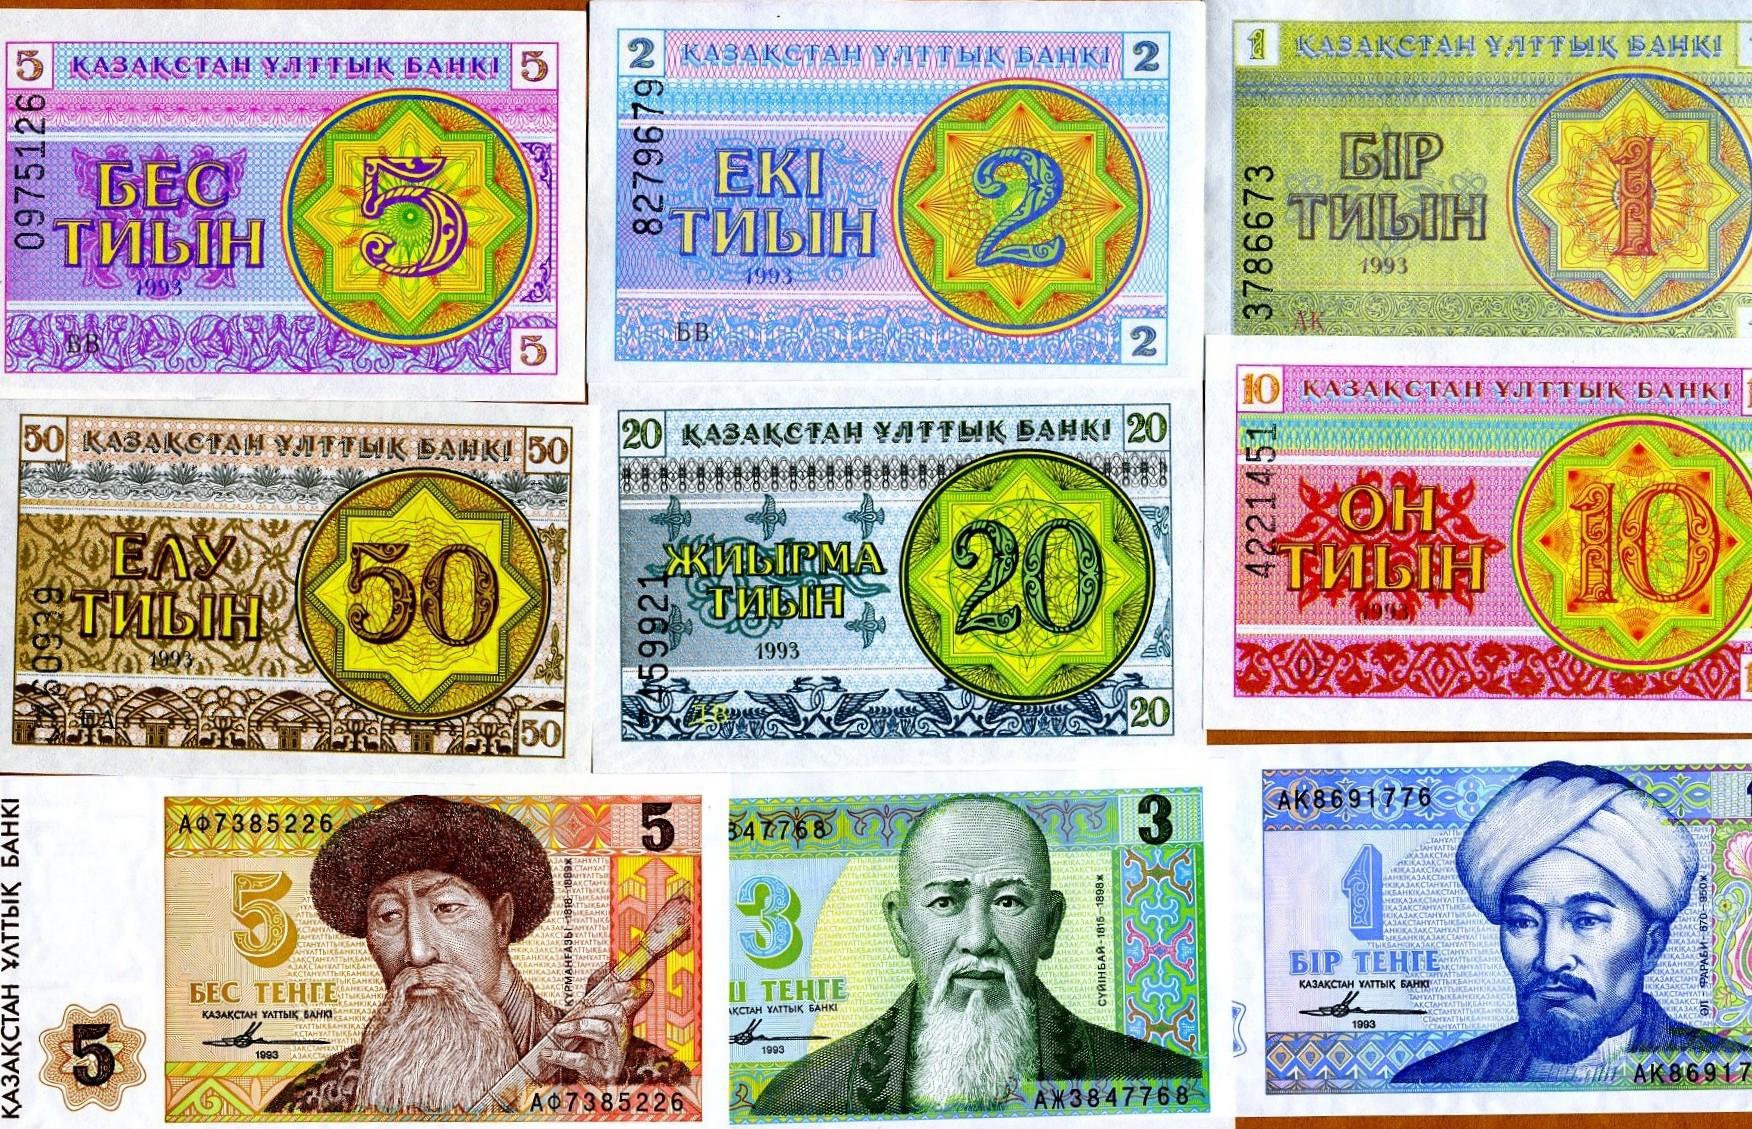 KAZAKHSTAN  1+2  TYIN 1993 Set  P 1+2  Uncirculated Banknotes